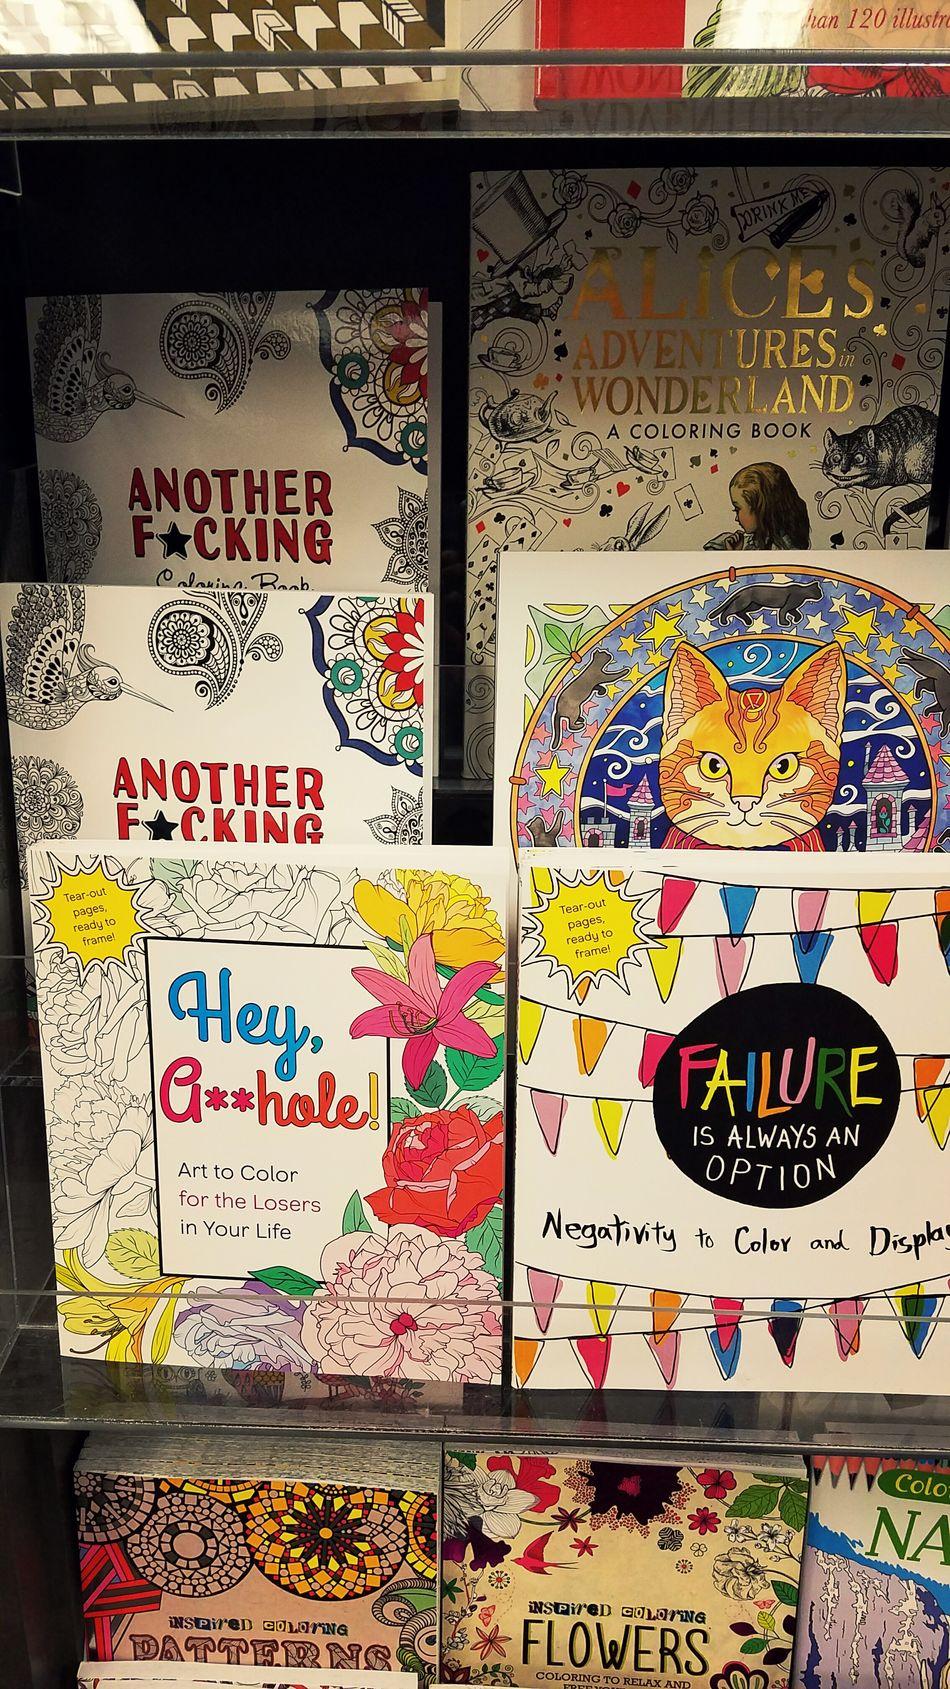 Adult Coloring 1 Coloring Color Coloring Book Coloringbook Adultcoloring Adultcoloringbook Bookstore Funny Cat Another Books Variety Cuss  Curse  Alice In Wonderland Alice Aliceinwonderland Failure  Fail Failure Is Always An Option